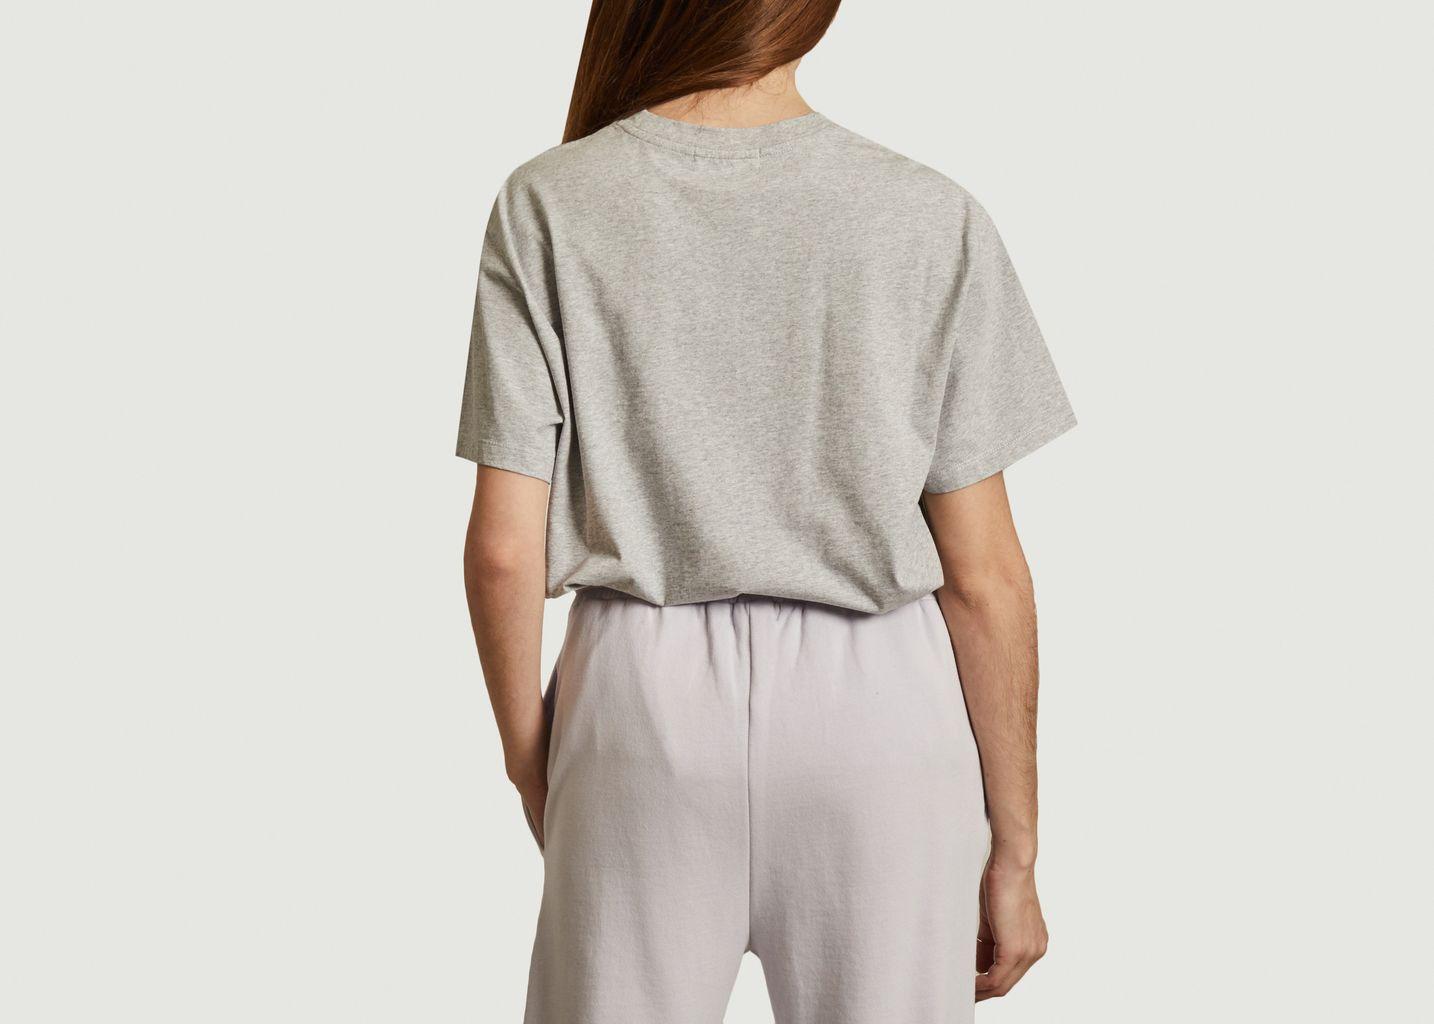 T-shirt Popincourt Pinup Disco - Maison Labiche